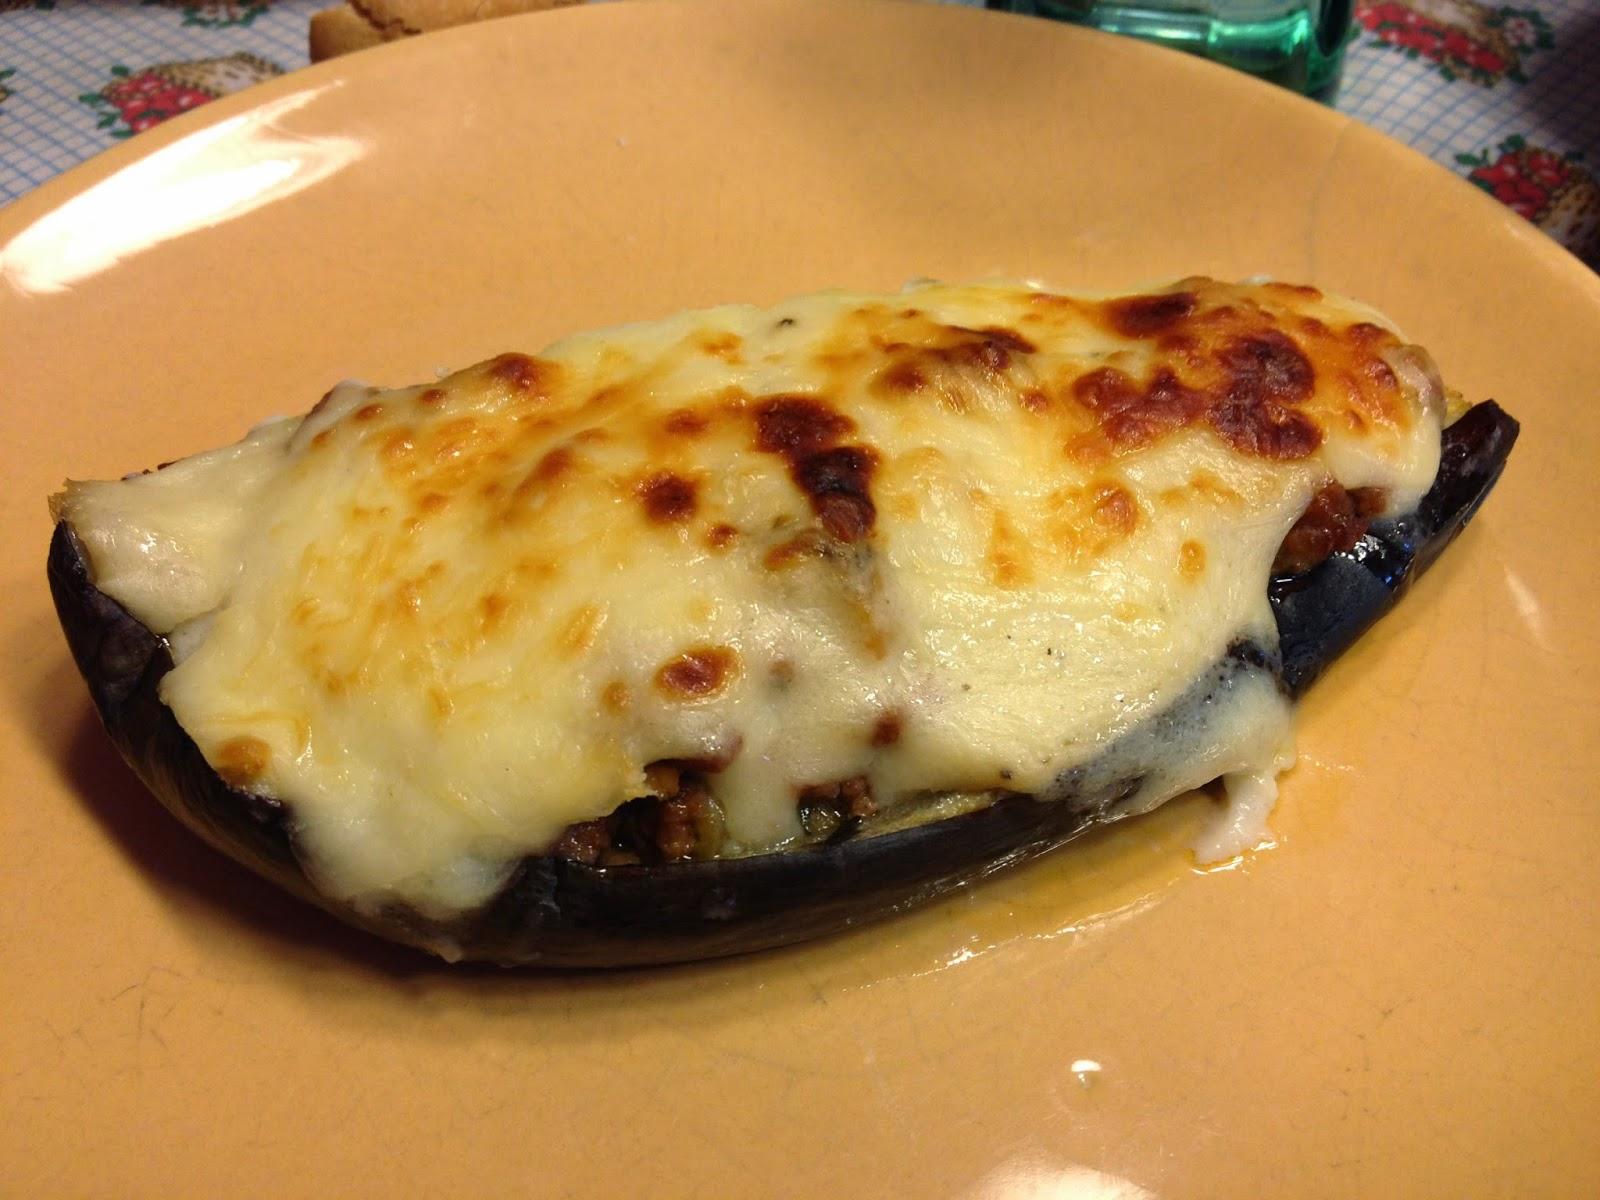 La cocina de casa berenjenas rellenas for Cocina berenjenas rellenas